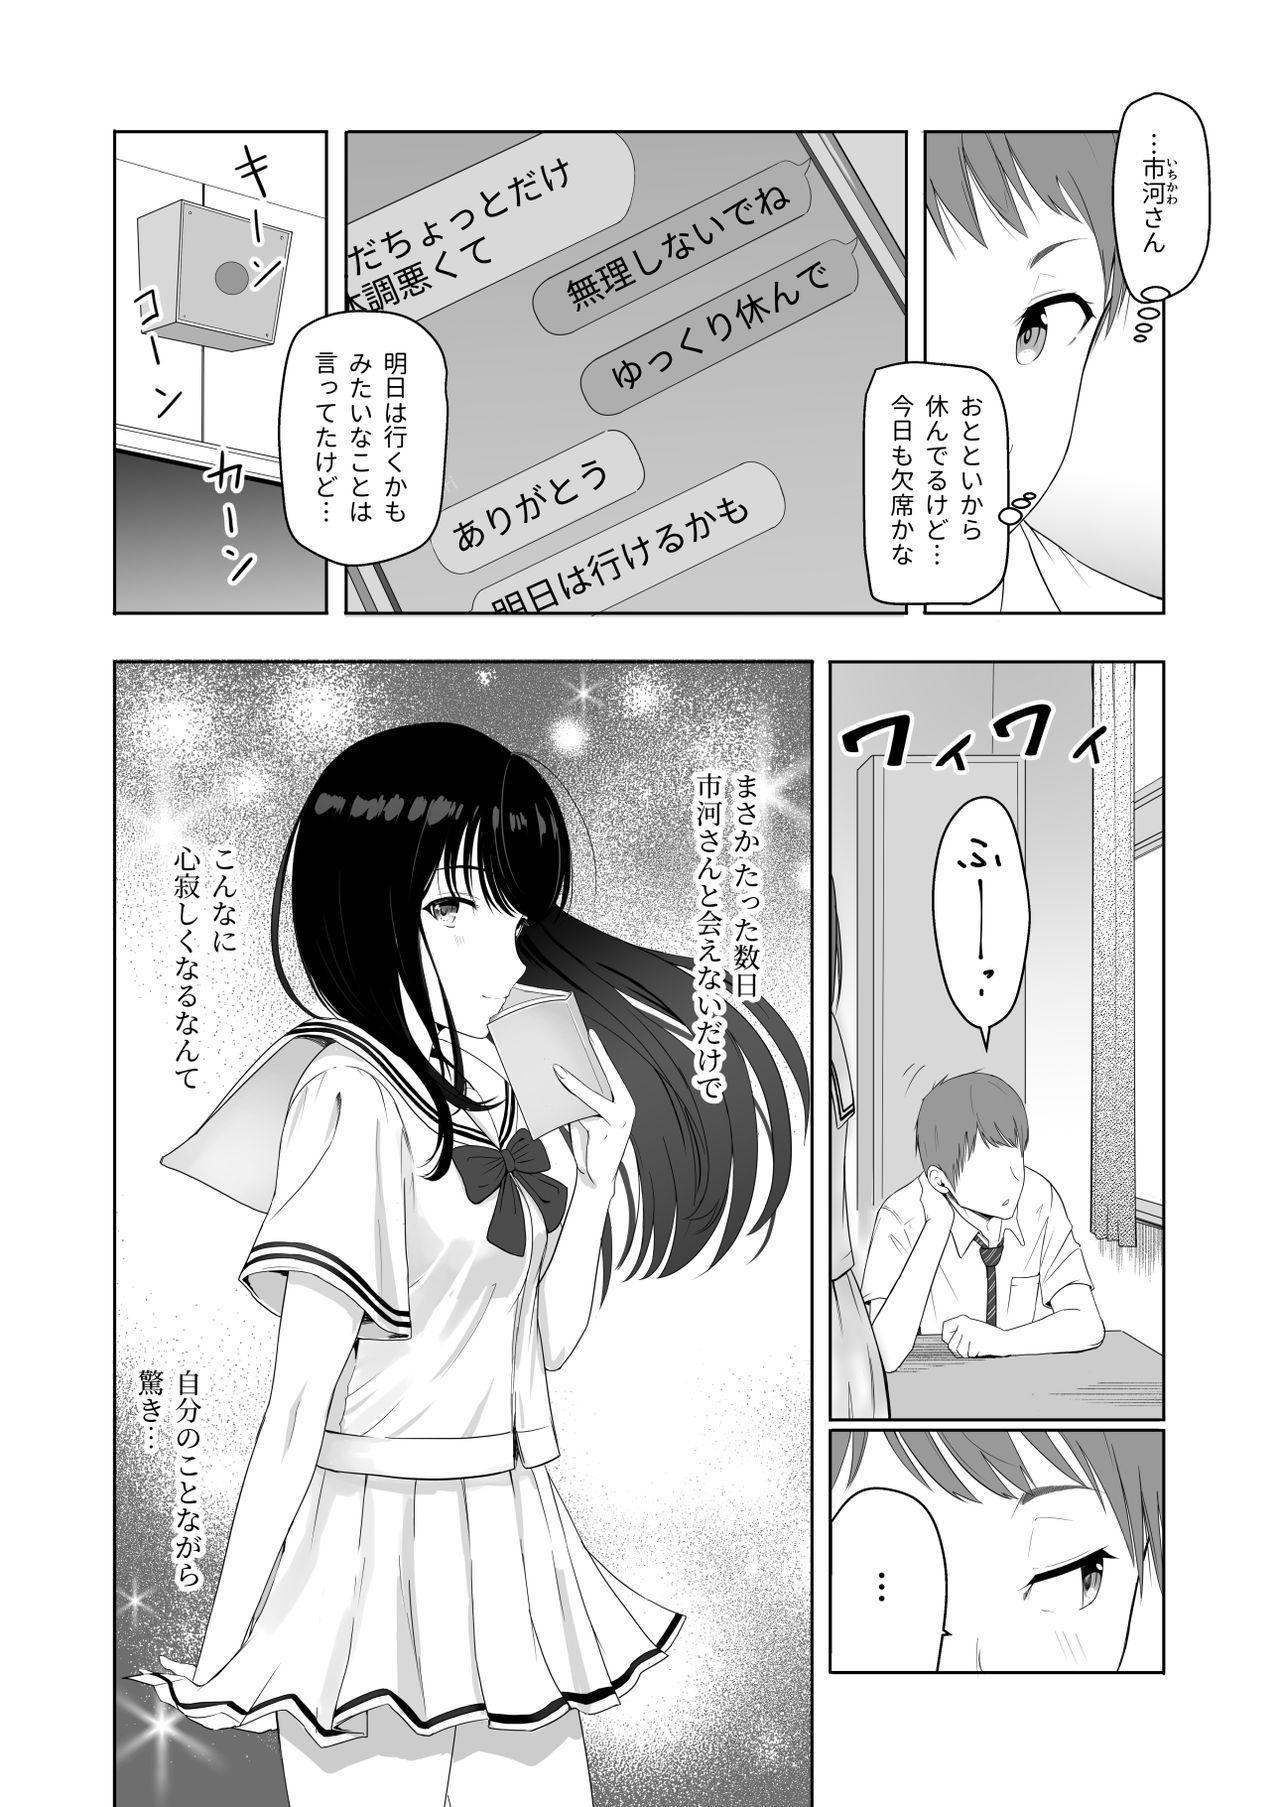 Kimi ga Tame. 2 Ichikawa Inori 4